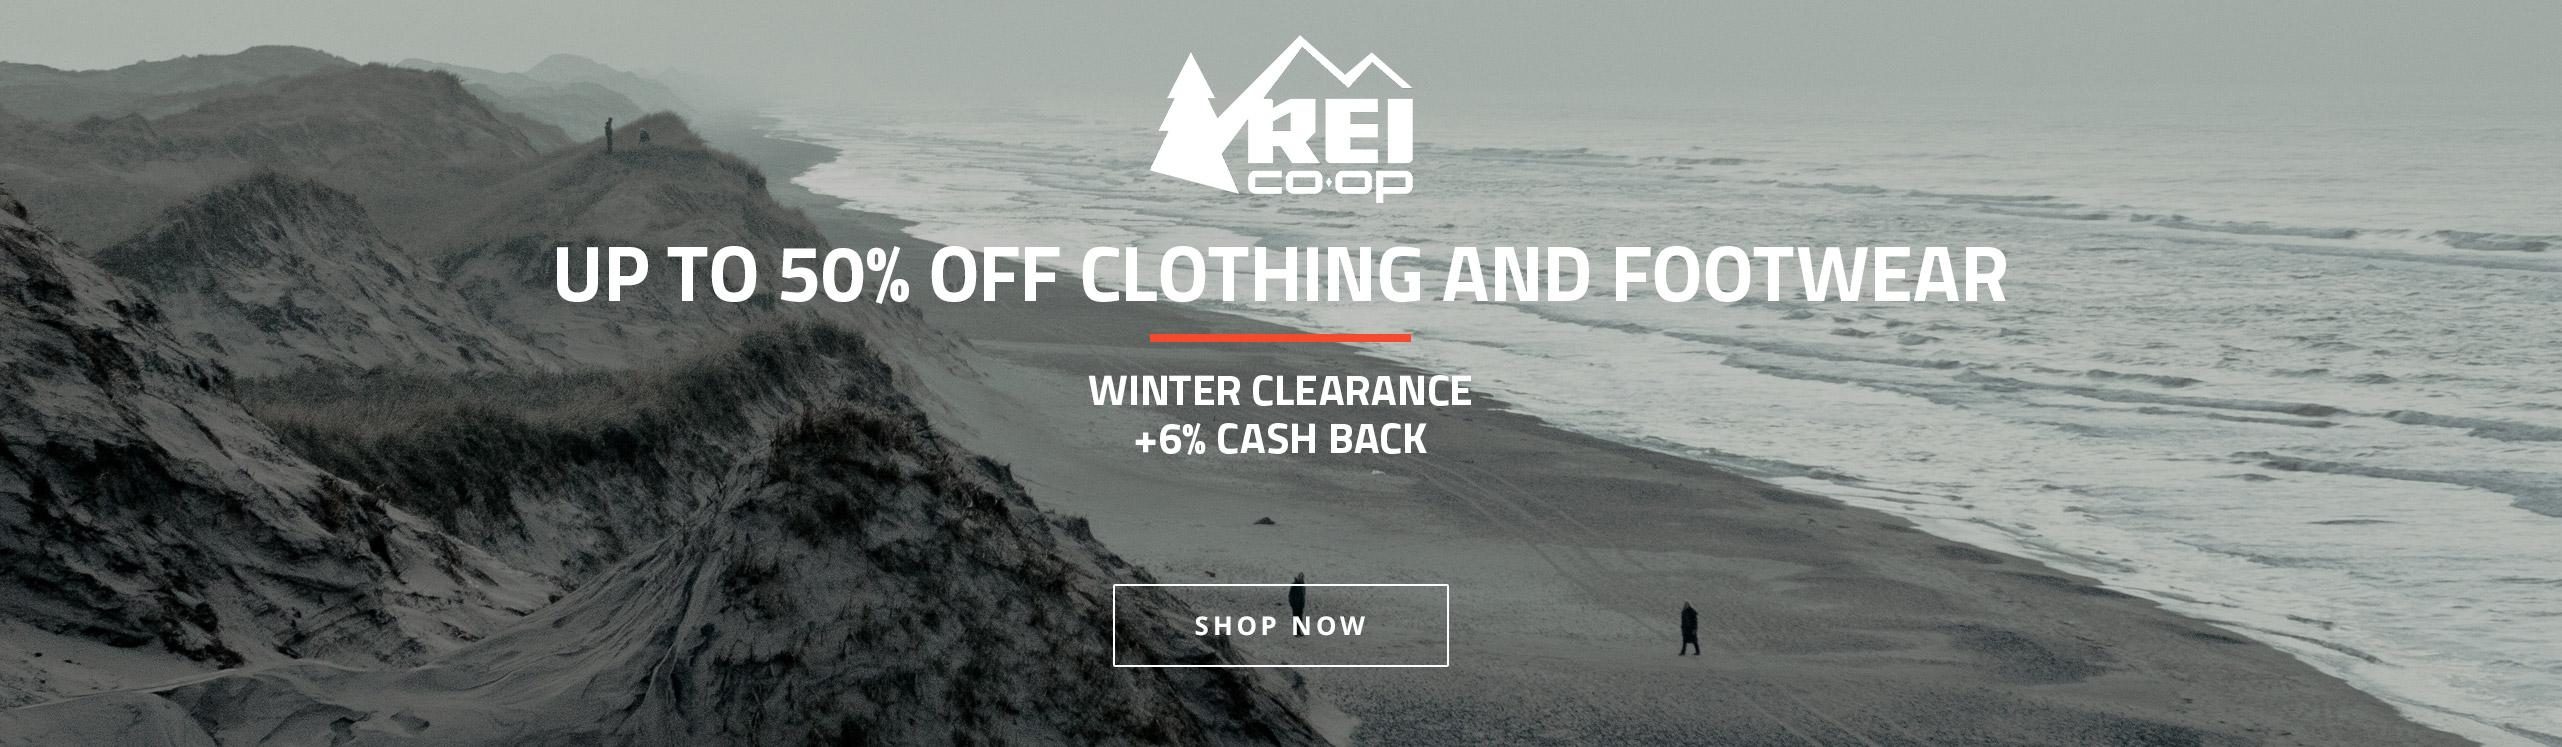 REI Winter Clearance